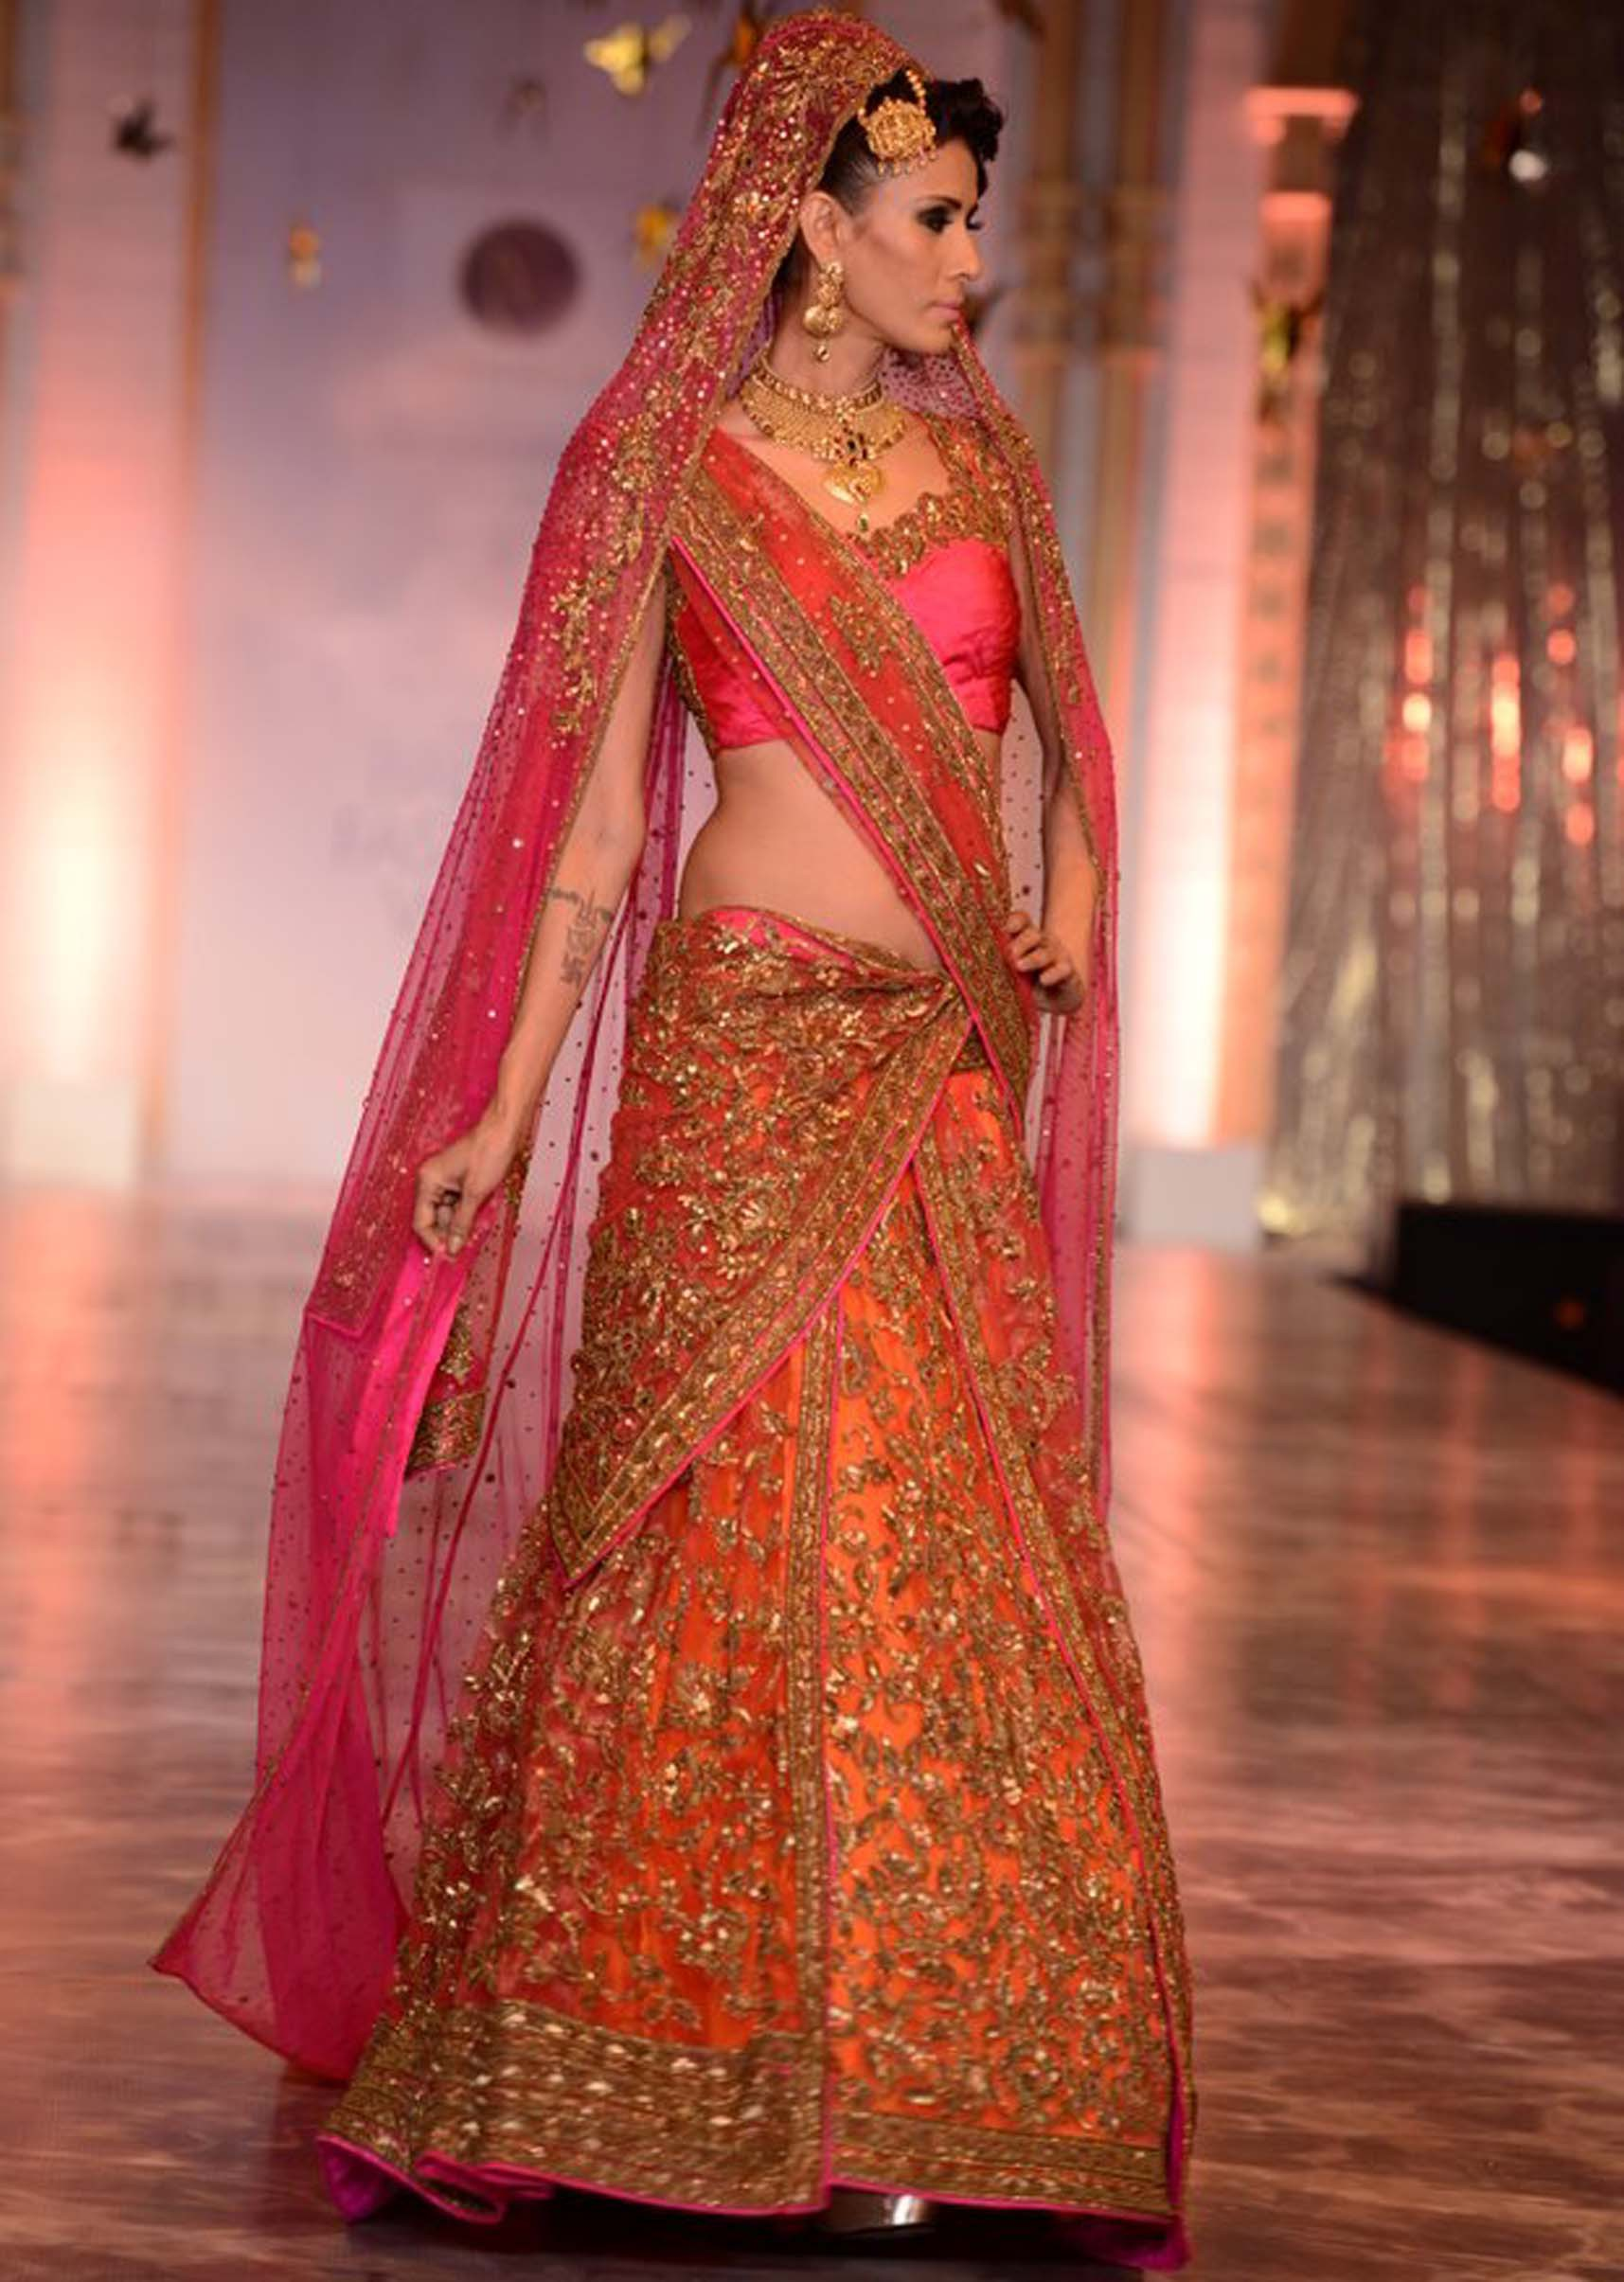 da5a9b2b817 Top 10 Indian Bridal Wear Designers - FashionPro